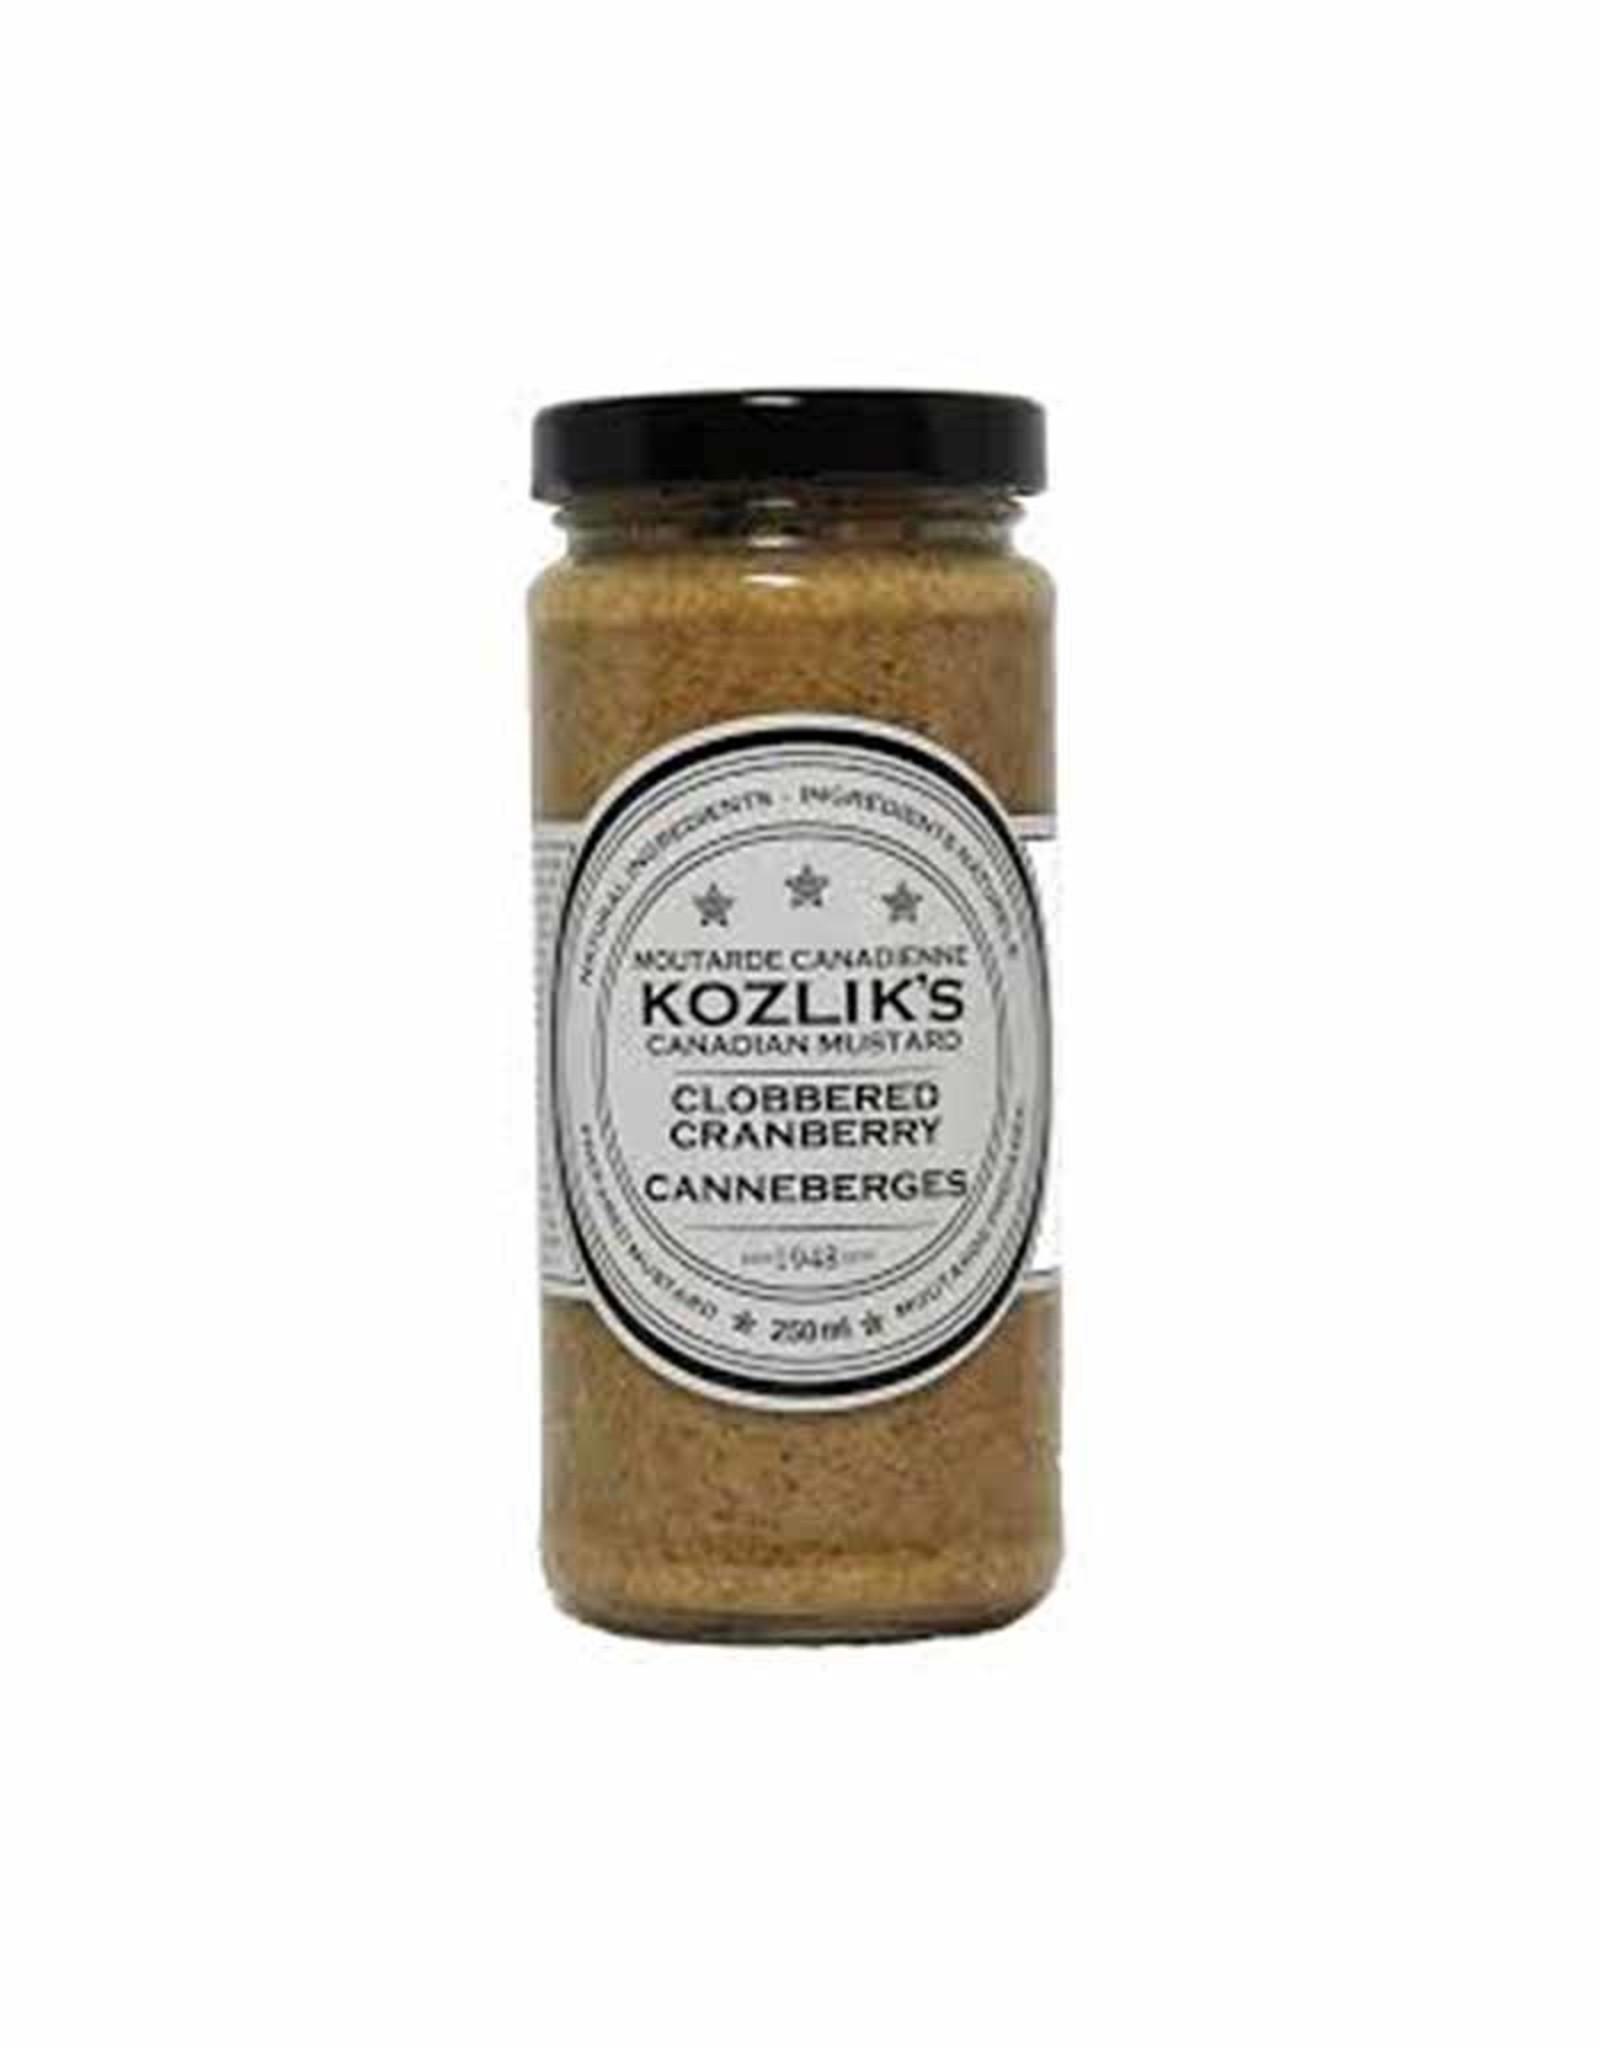 Kozliks Kozliks - Mustard, Clobbered Cranberry